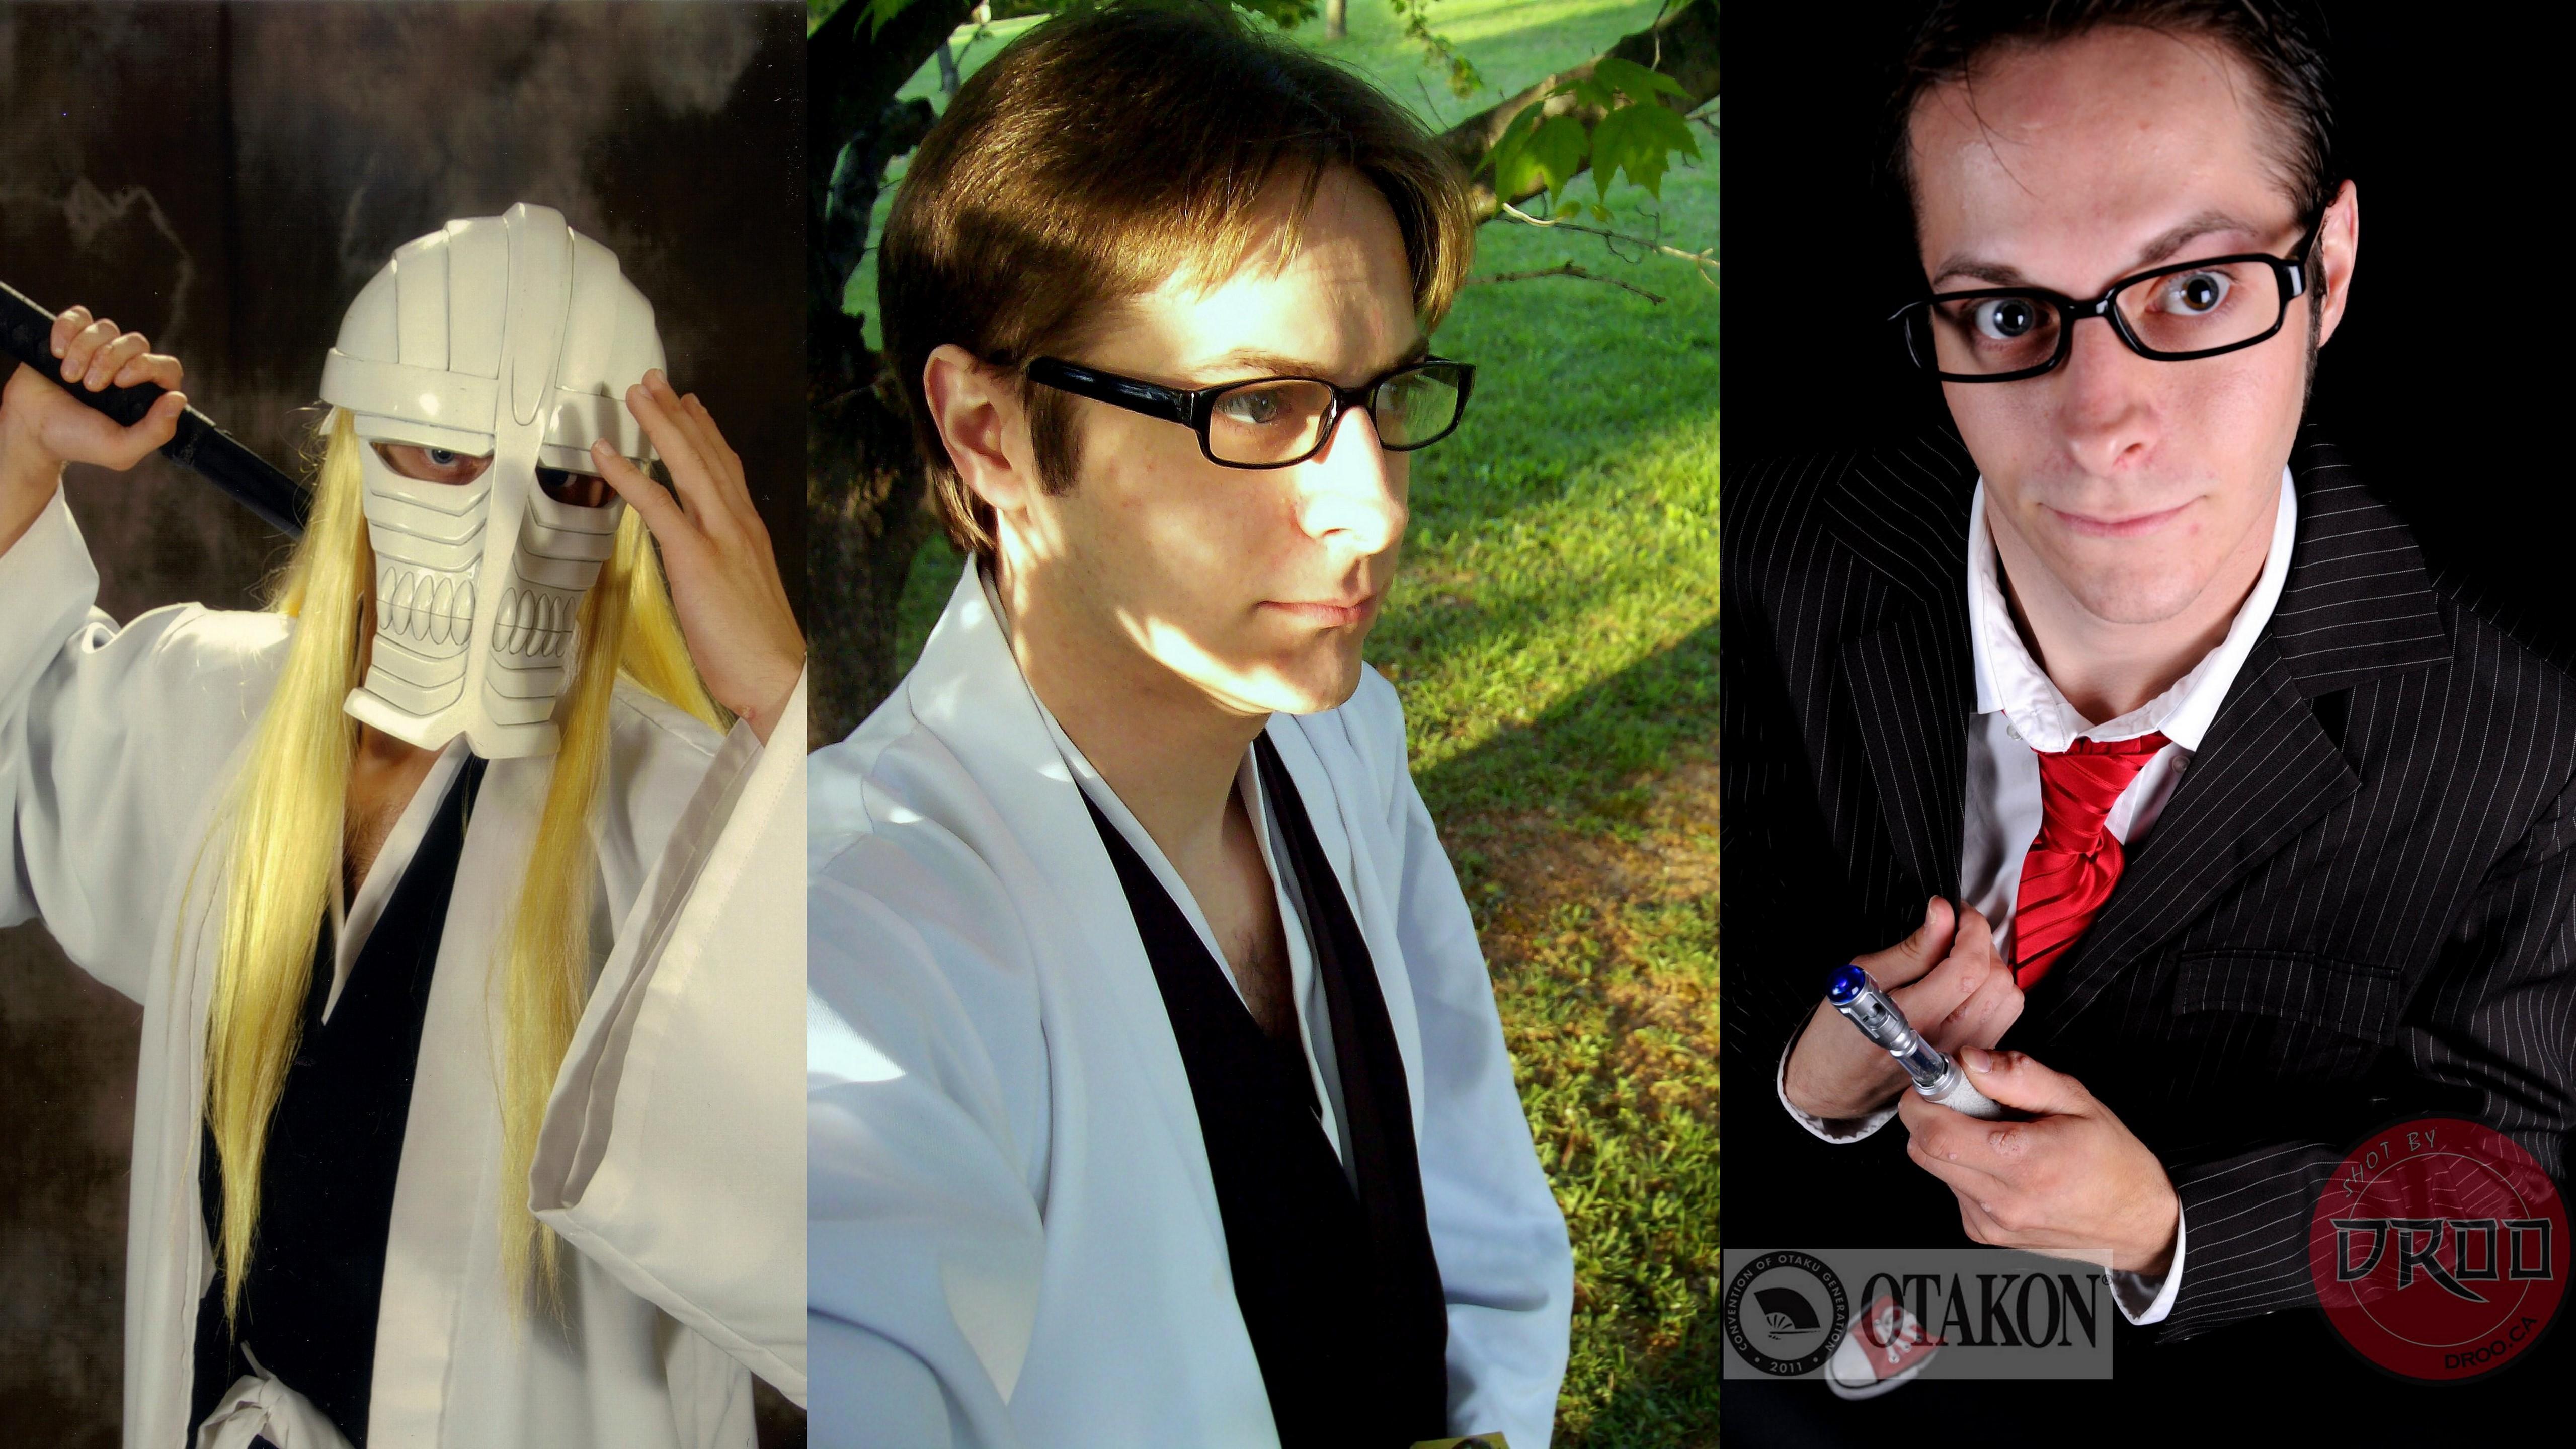 DoctorTonyStarkWho's Profile Picture